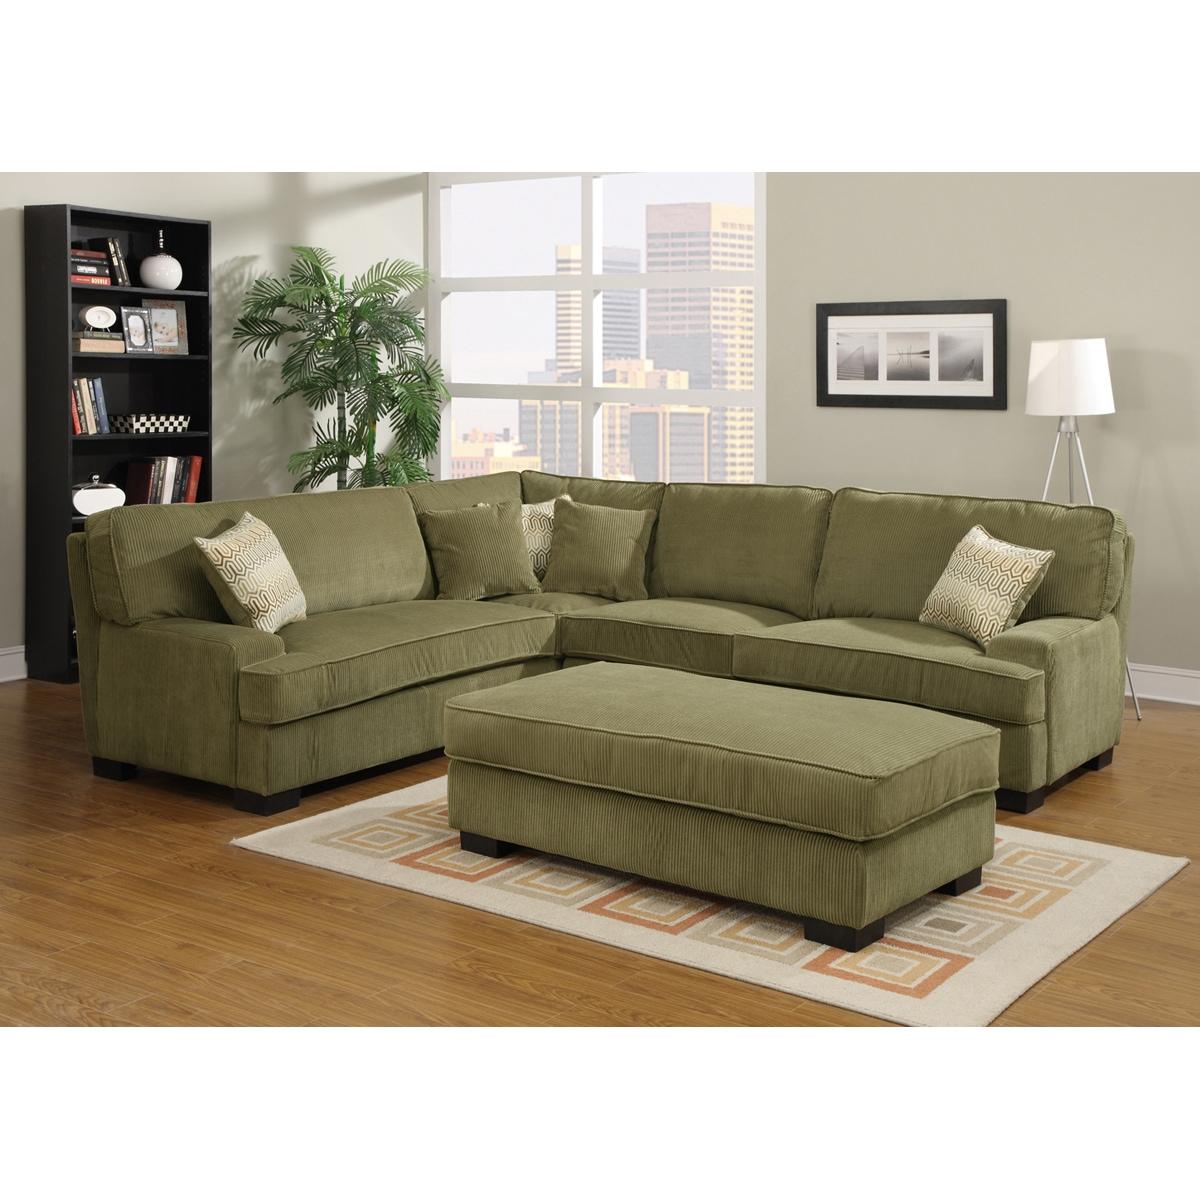 Noah Olive Green Living Room Set